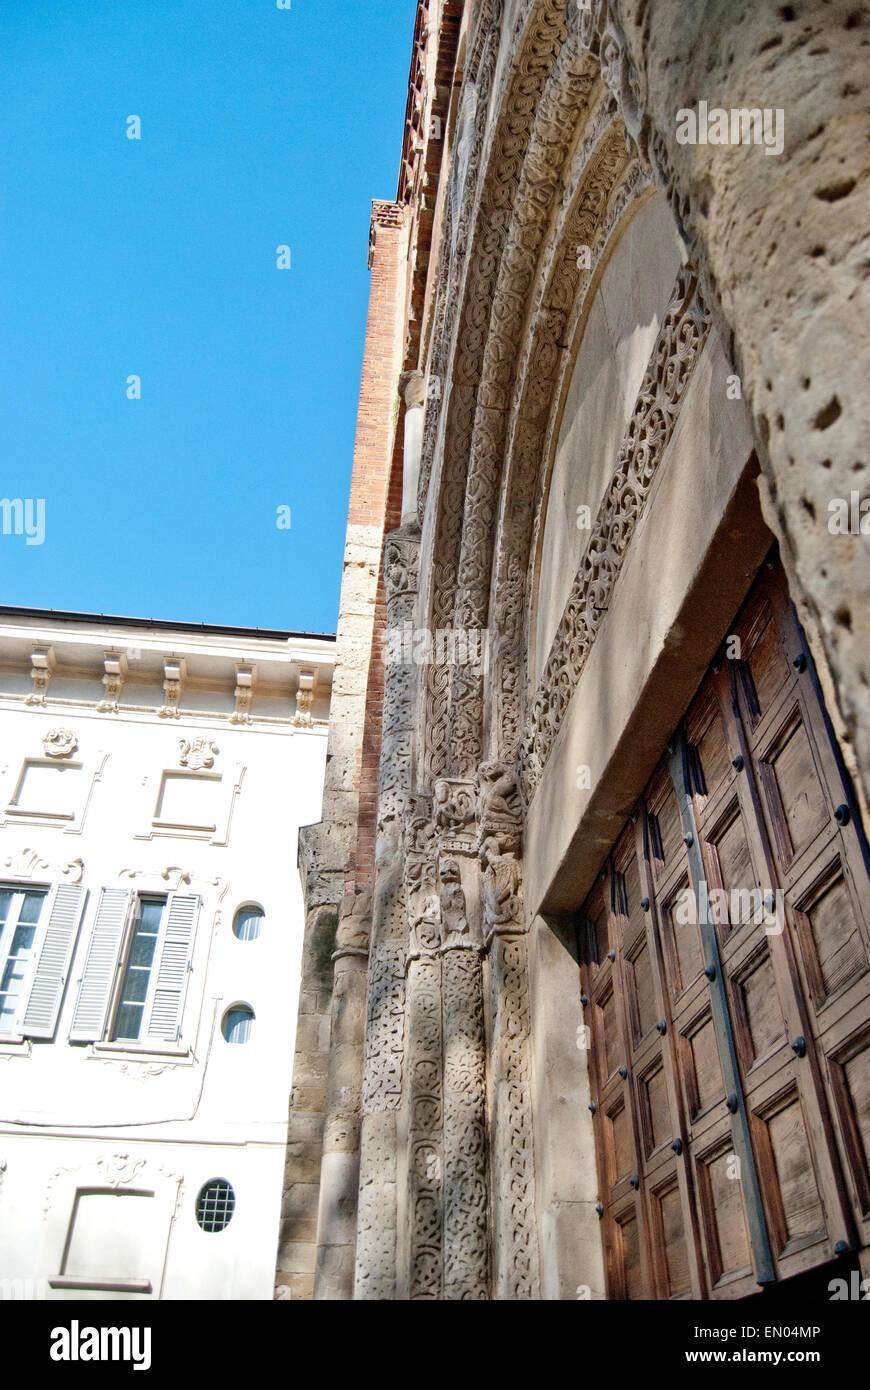 portal of San Pietro in Ciel d'oro, Pavia, italy - Stock Image